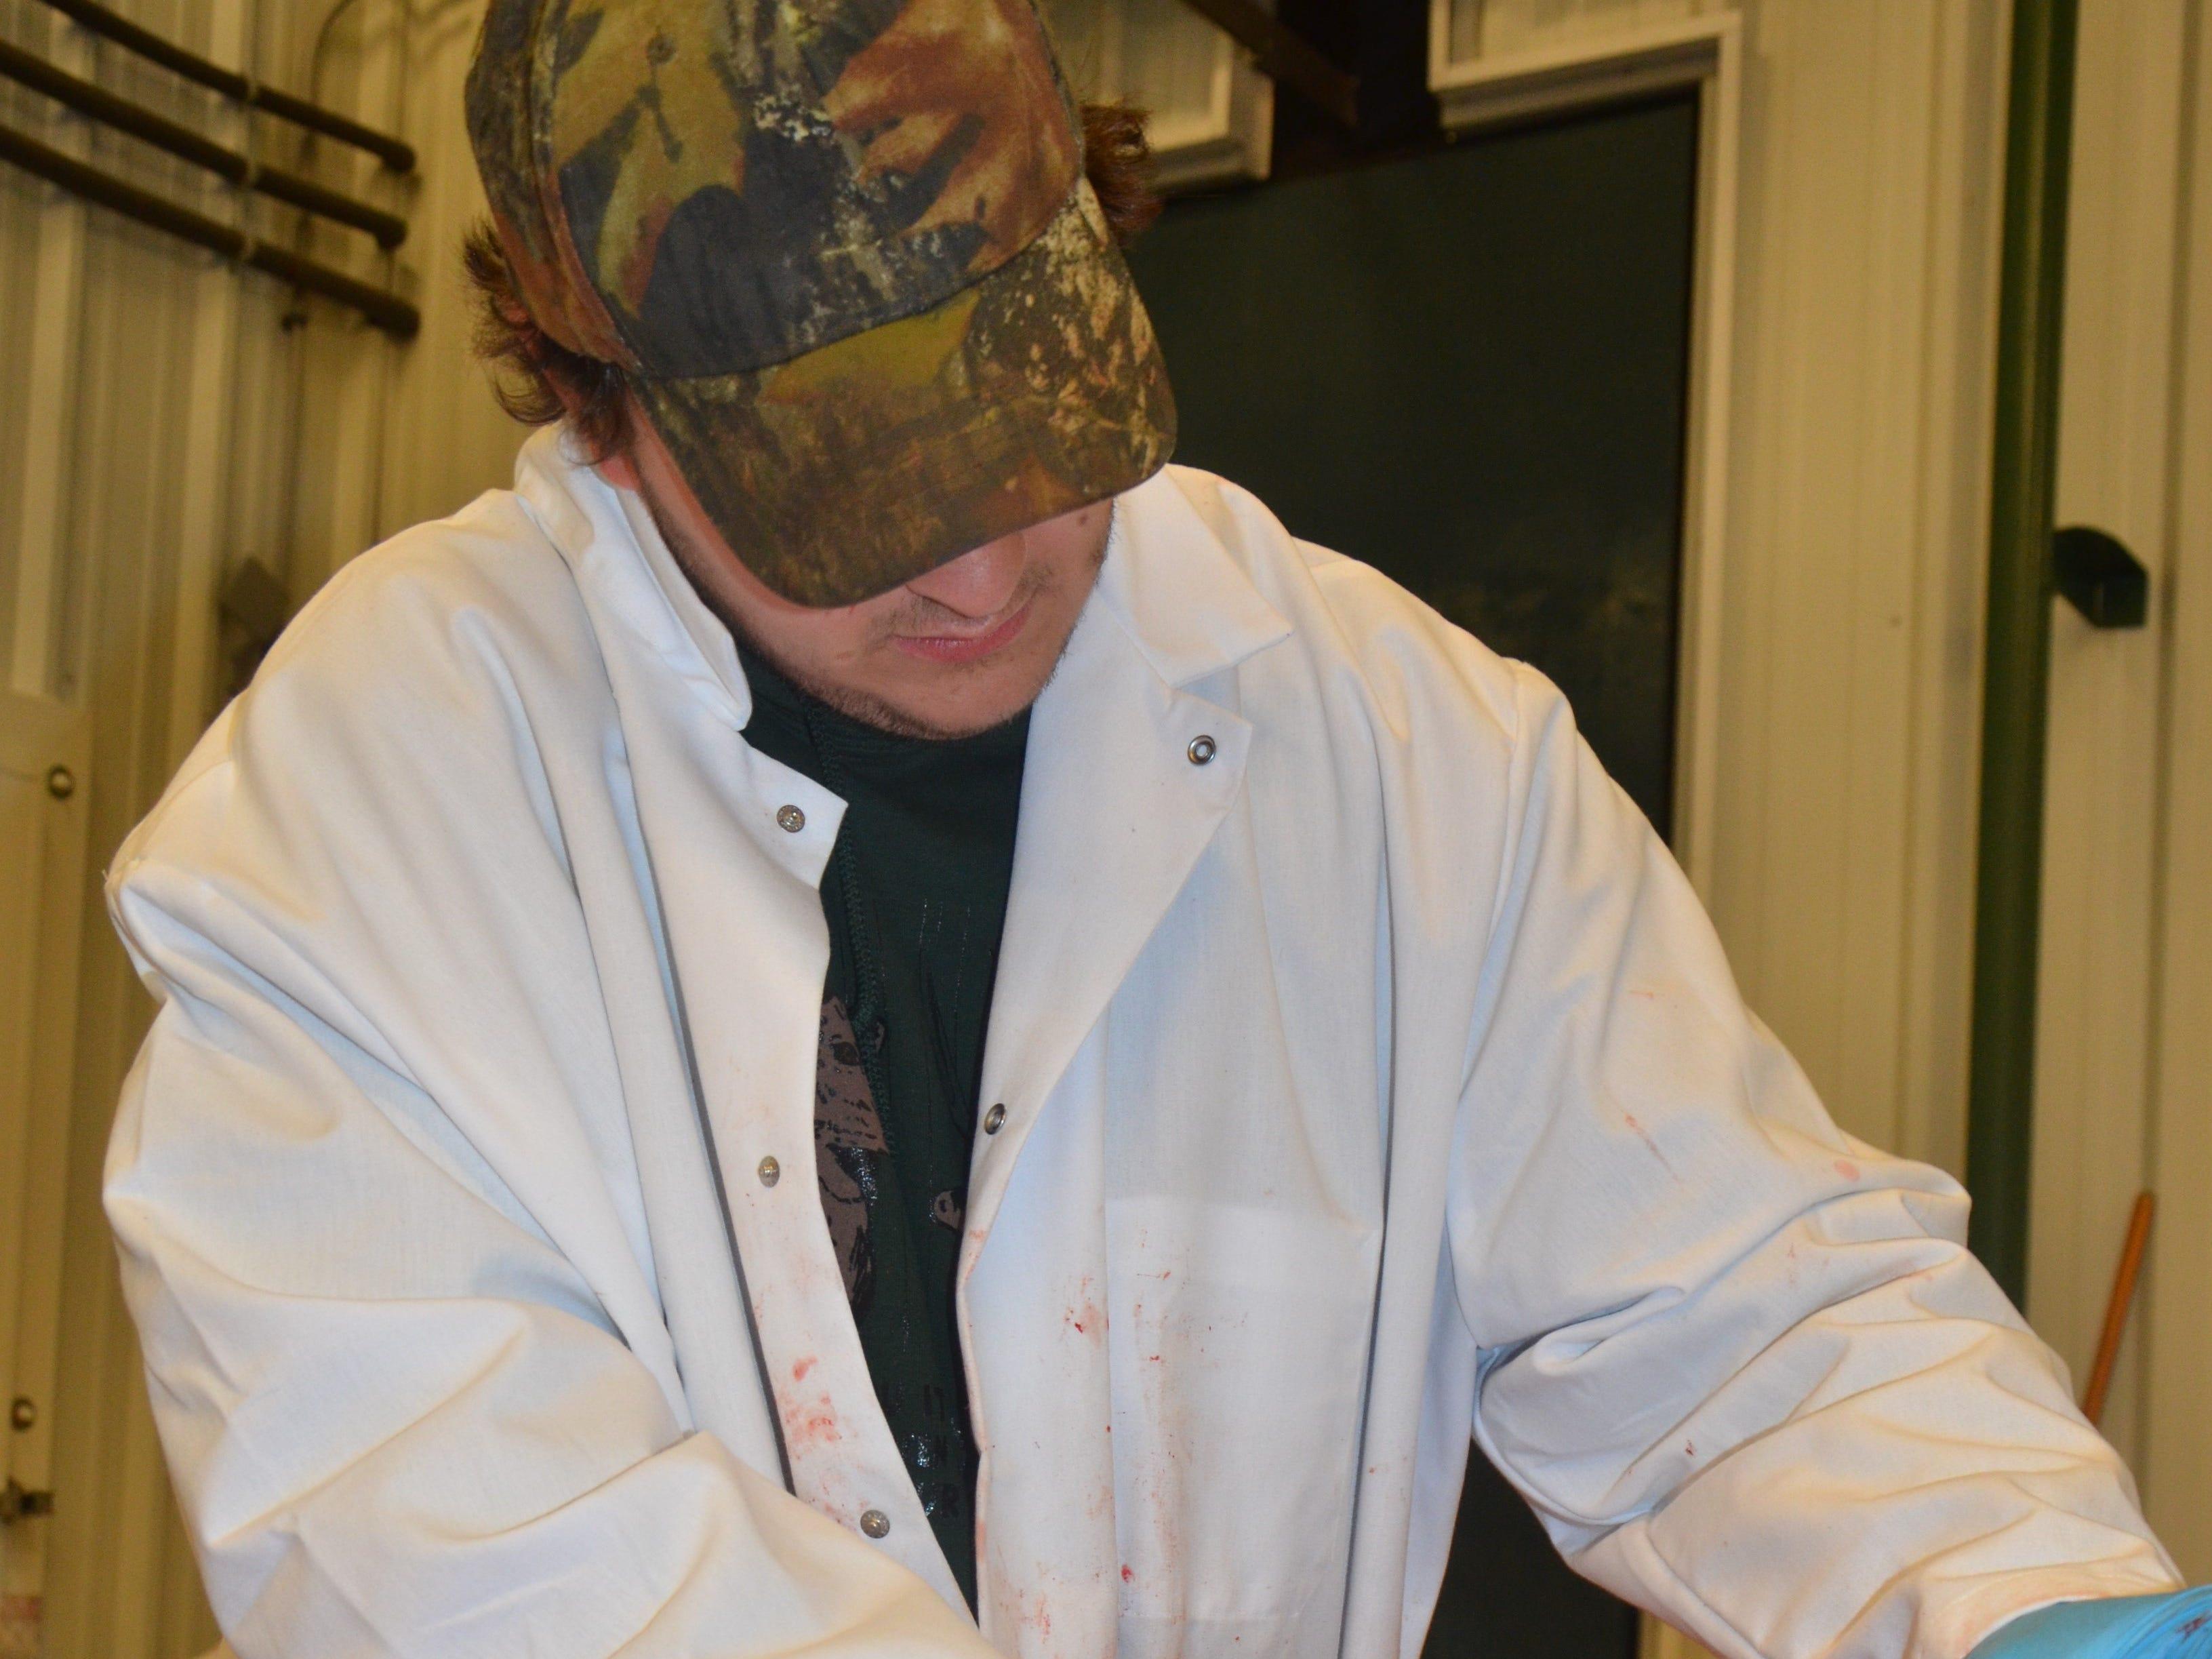 Justen Knight debones venison at Whitetail Farms in Olivet.